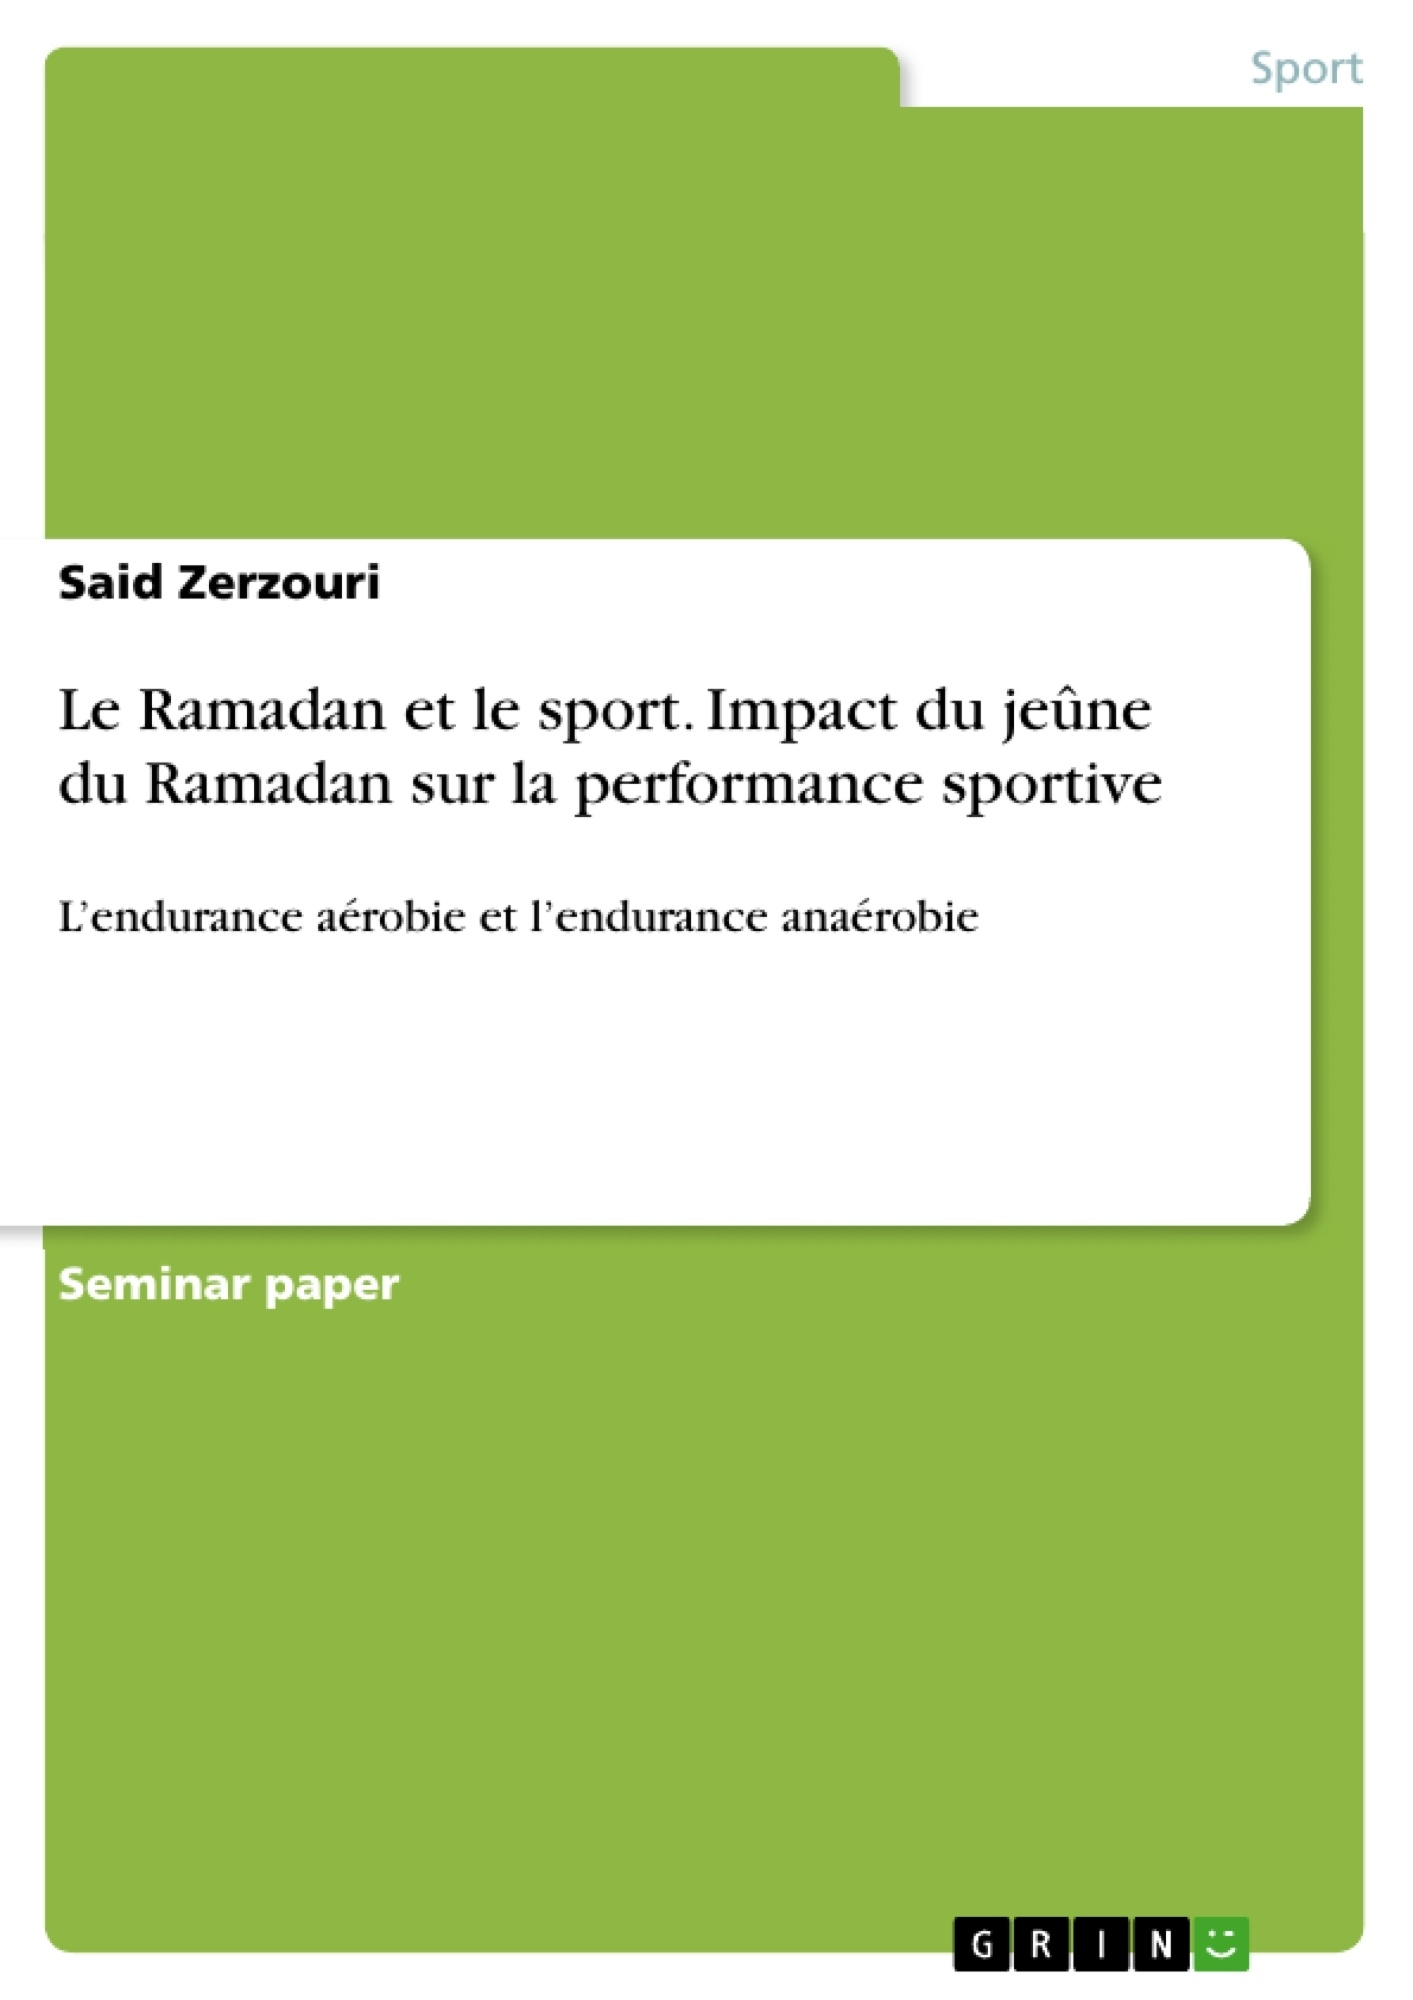 Titre: Le Ramadan et le sport. Impact du jeûne du Ramadan sur la performance sportive